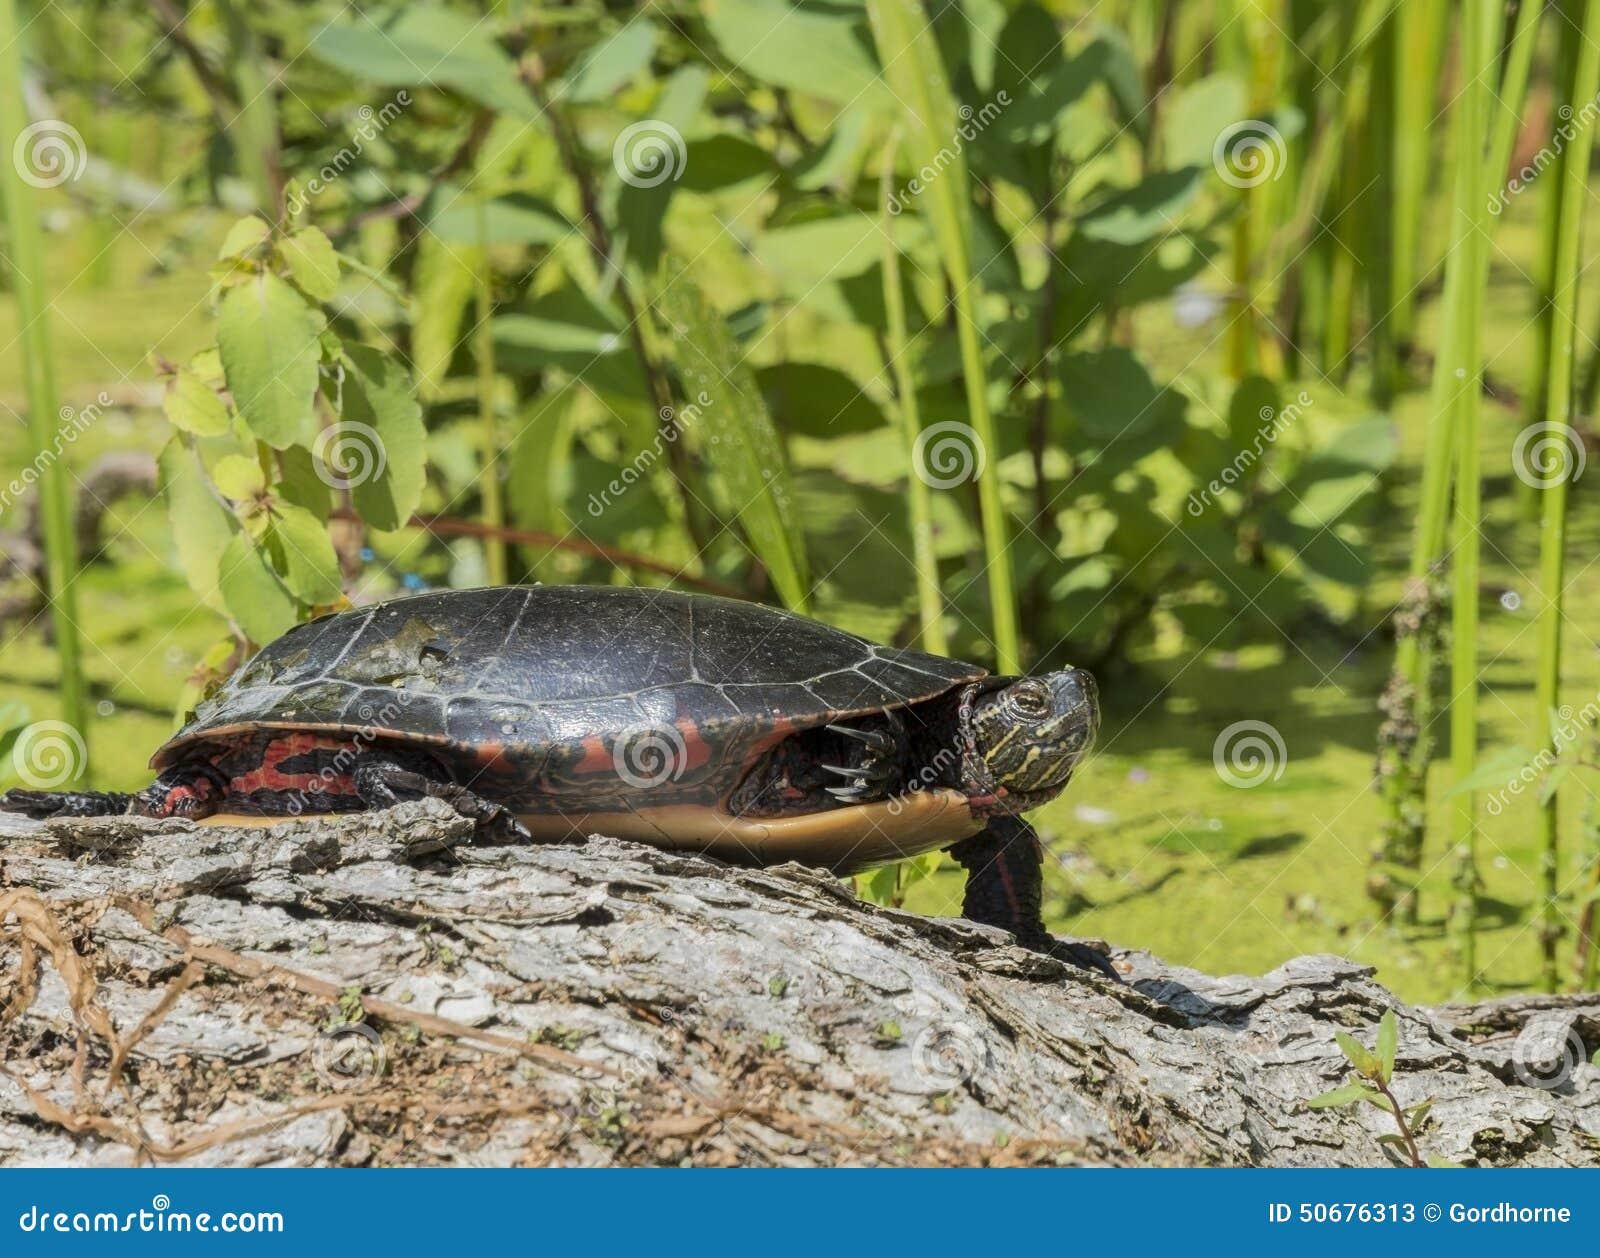 Download 在乌龟的特写镜头 库存图片. 图片 包括有 沼泽, 颜色, 旅行, 乌龟, 假期, 背包, 旅游业, 保护 - 50676313